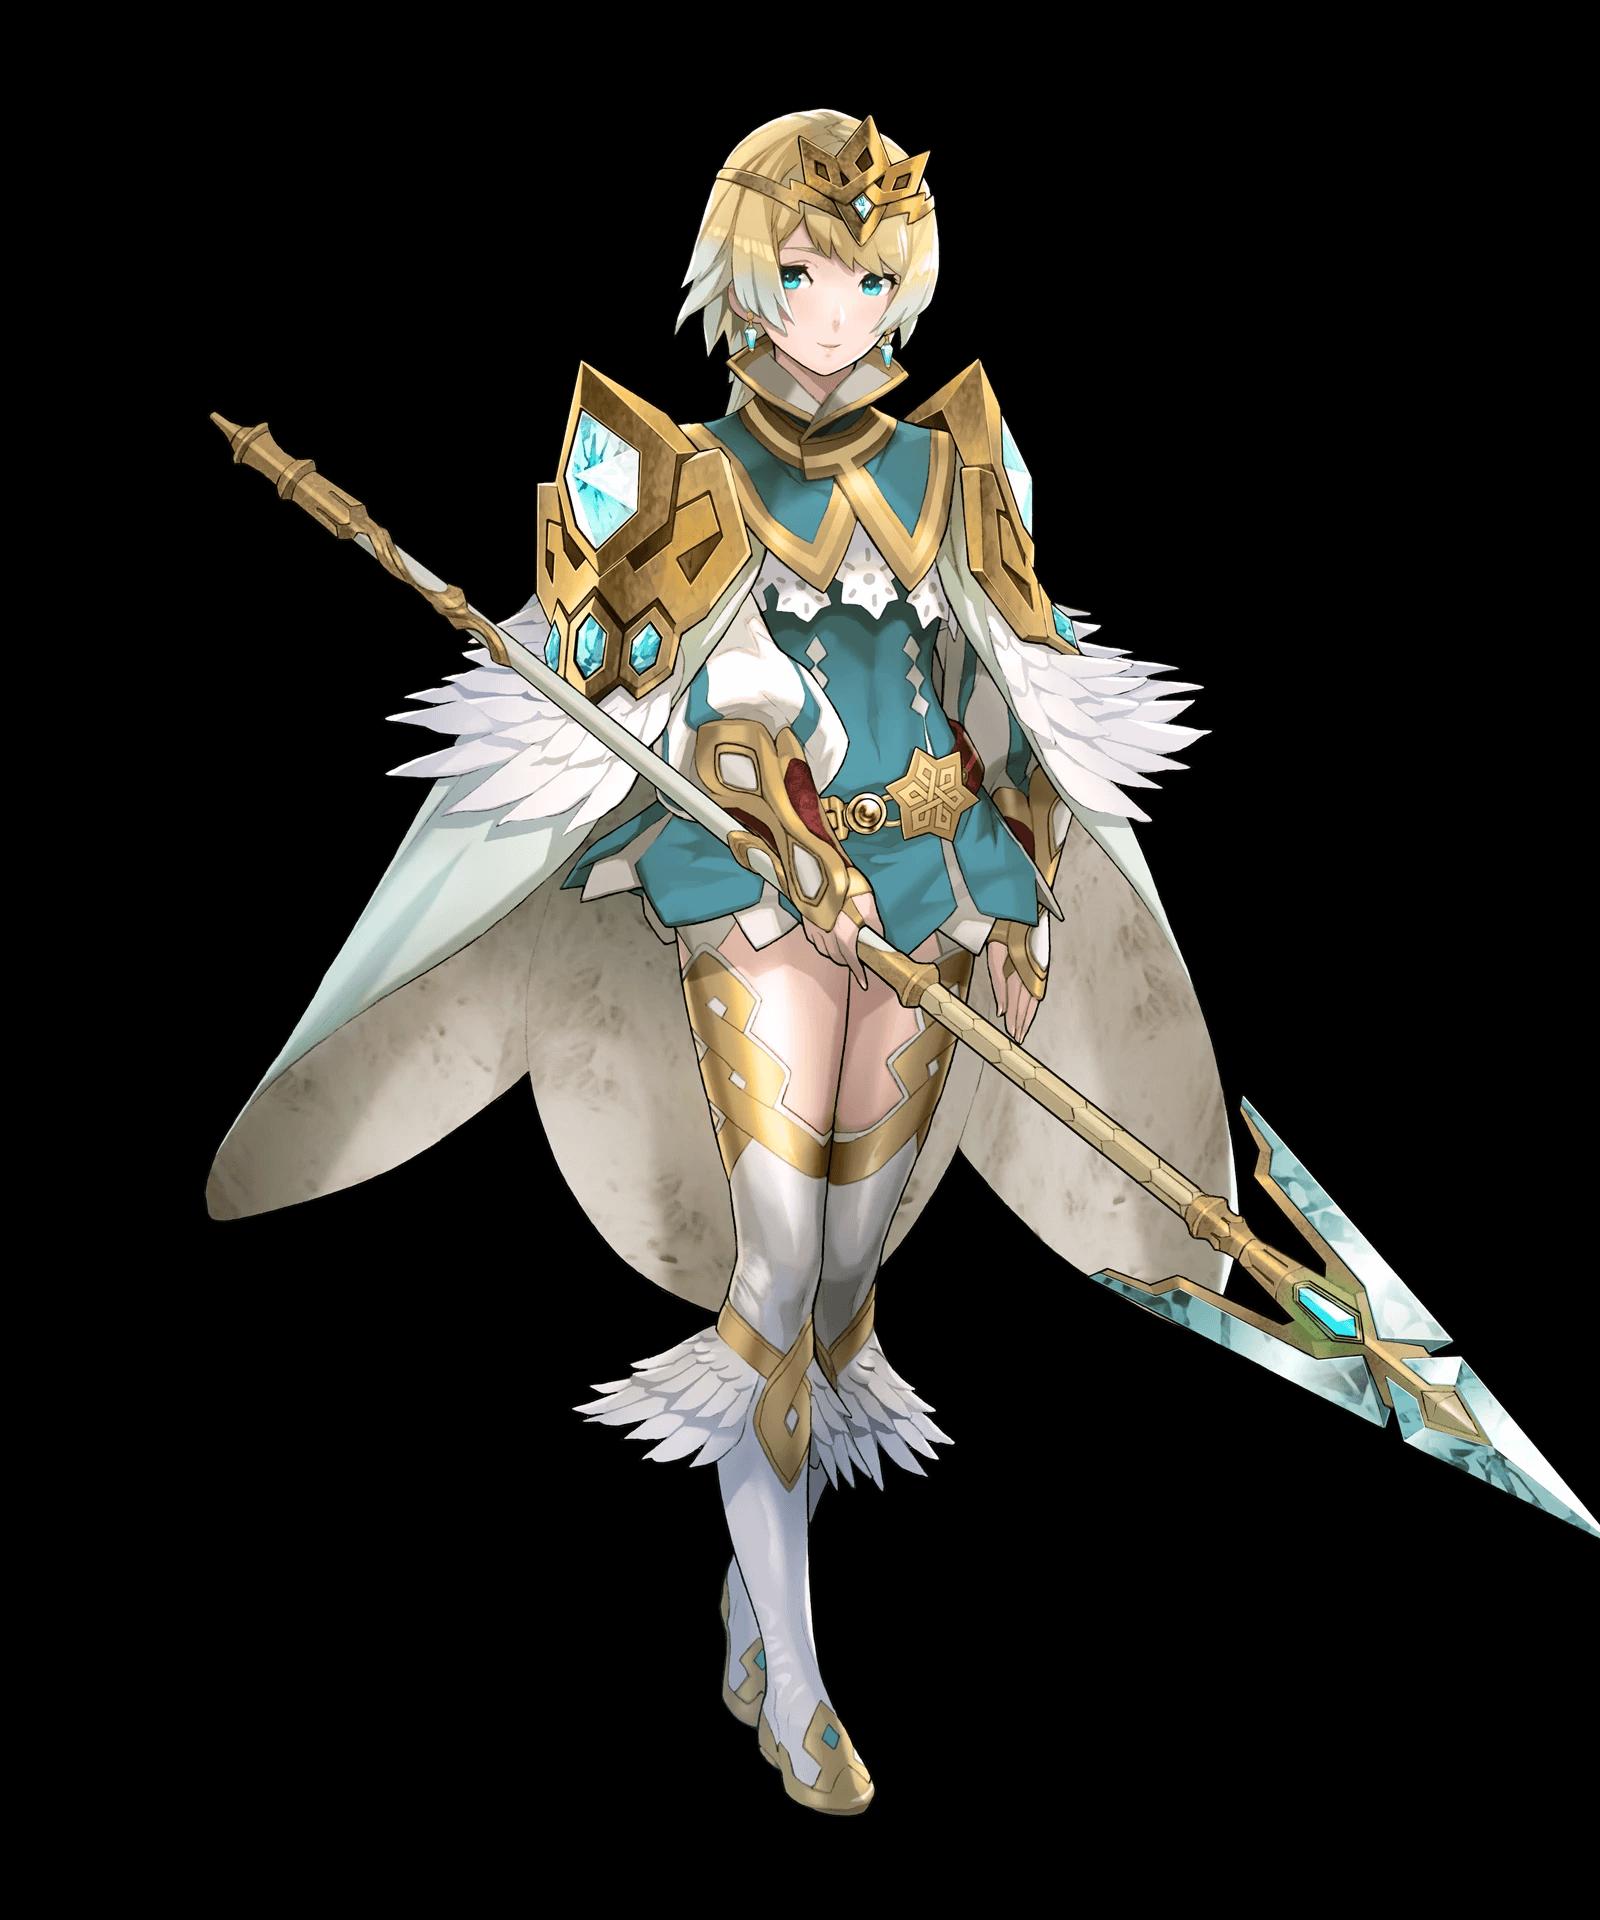 Fjorm | Fire Emblem Heroes Wiki - GamePress